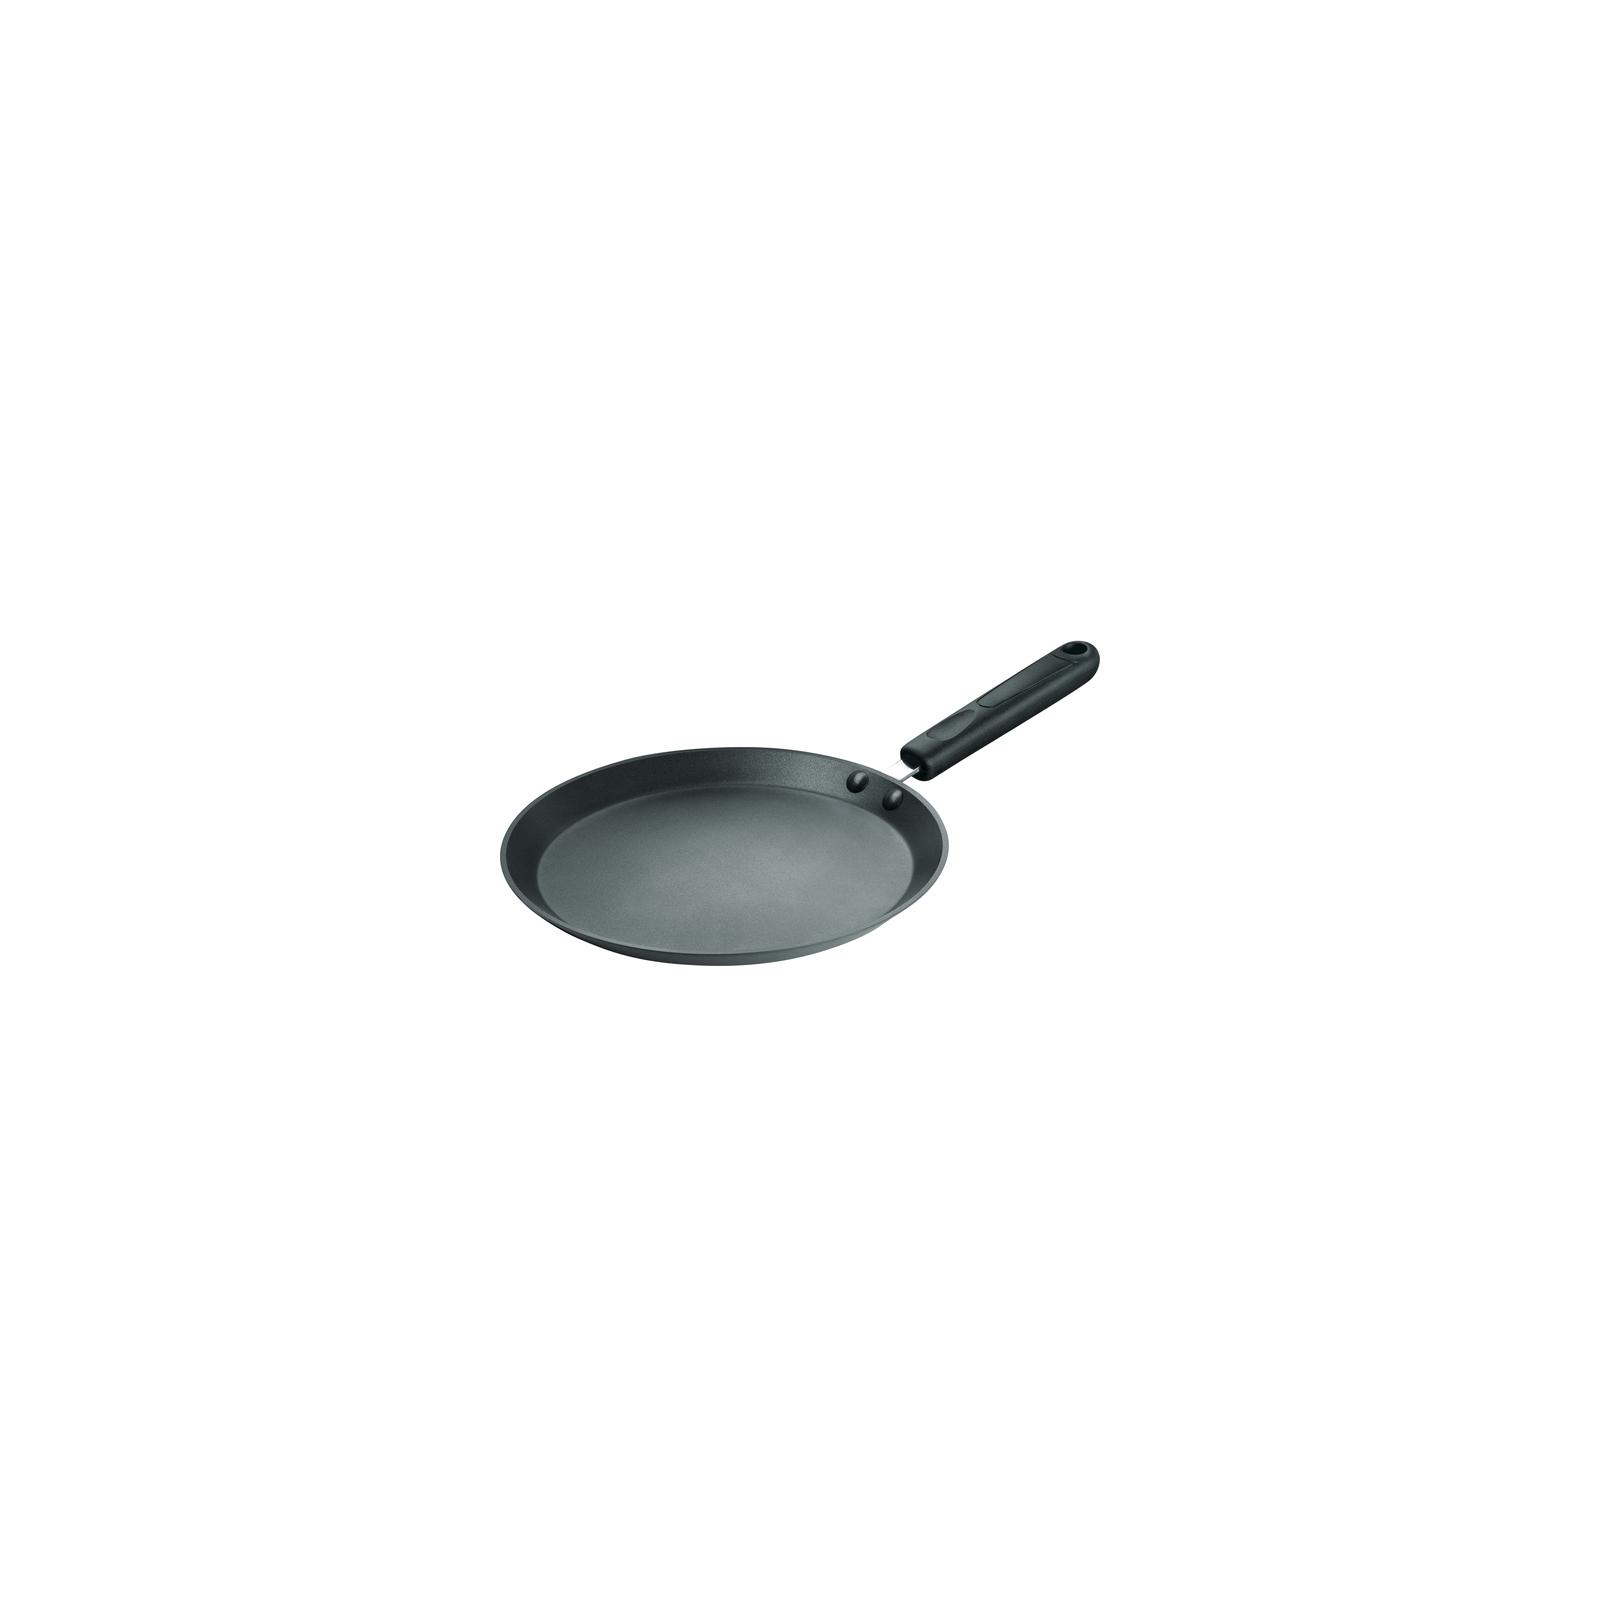 Сковорода Rondell Pancake frypan для блинов 26 см (RDA-128)